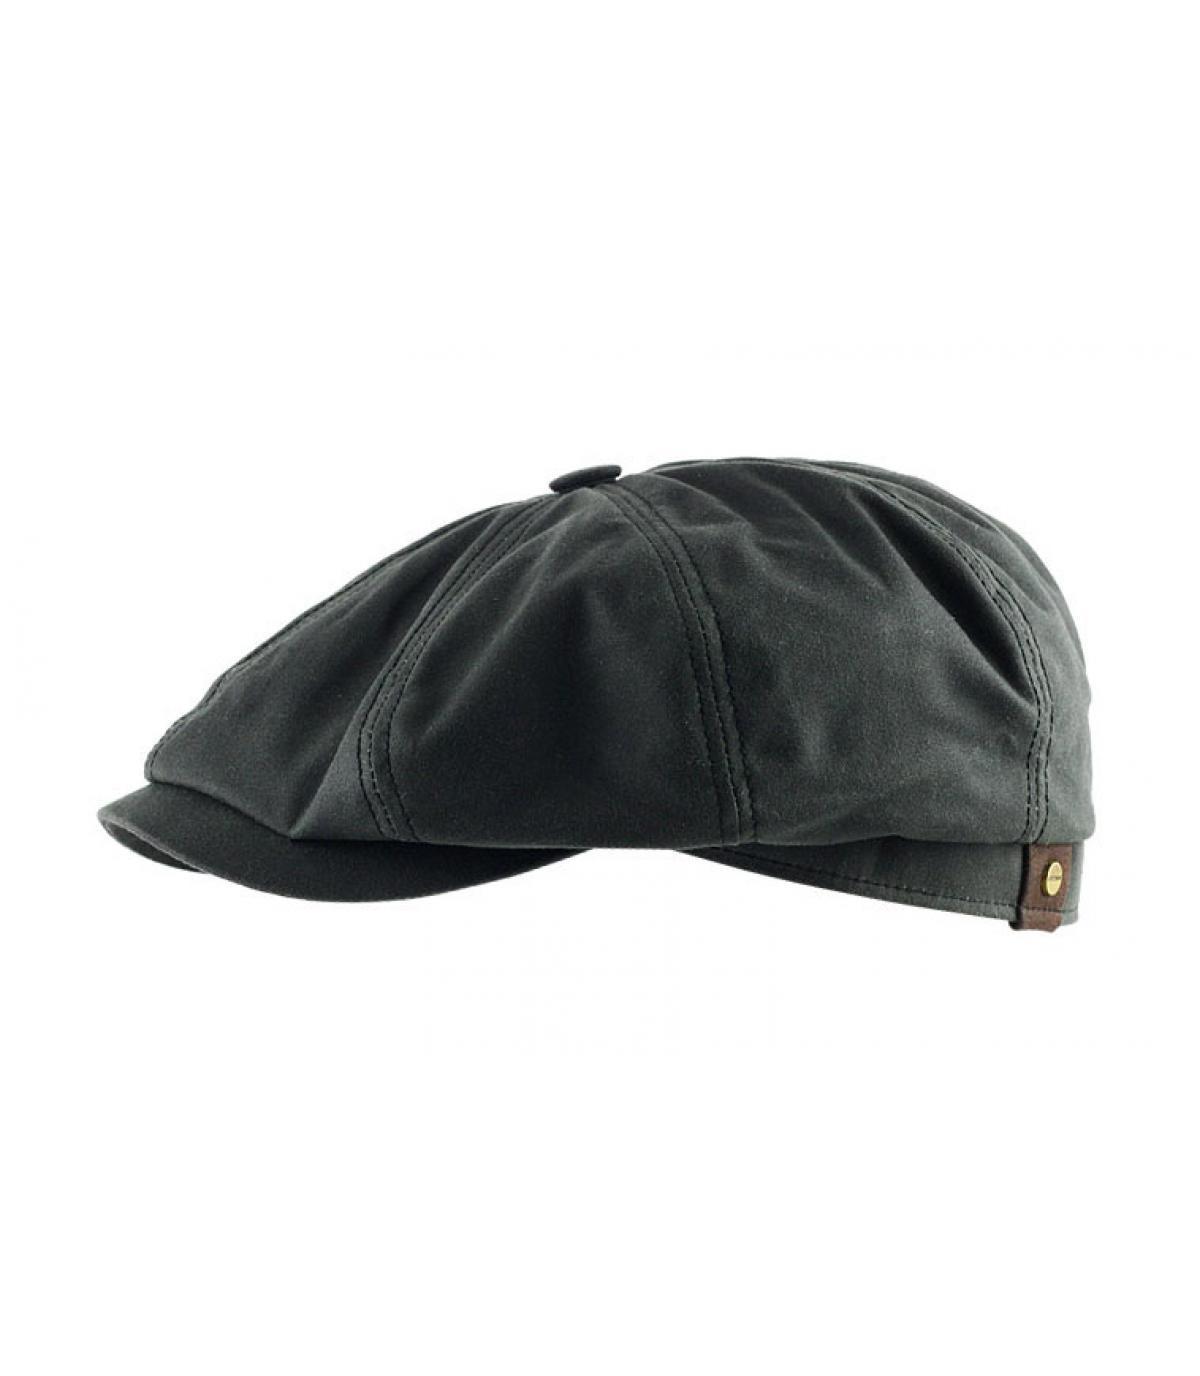 Cappellino Hatteras nero